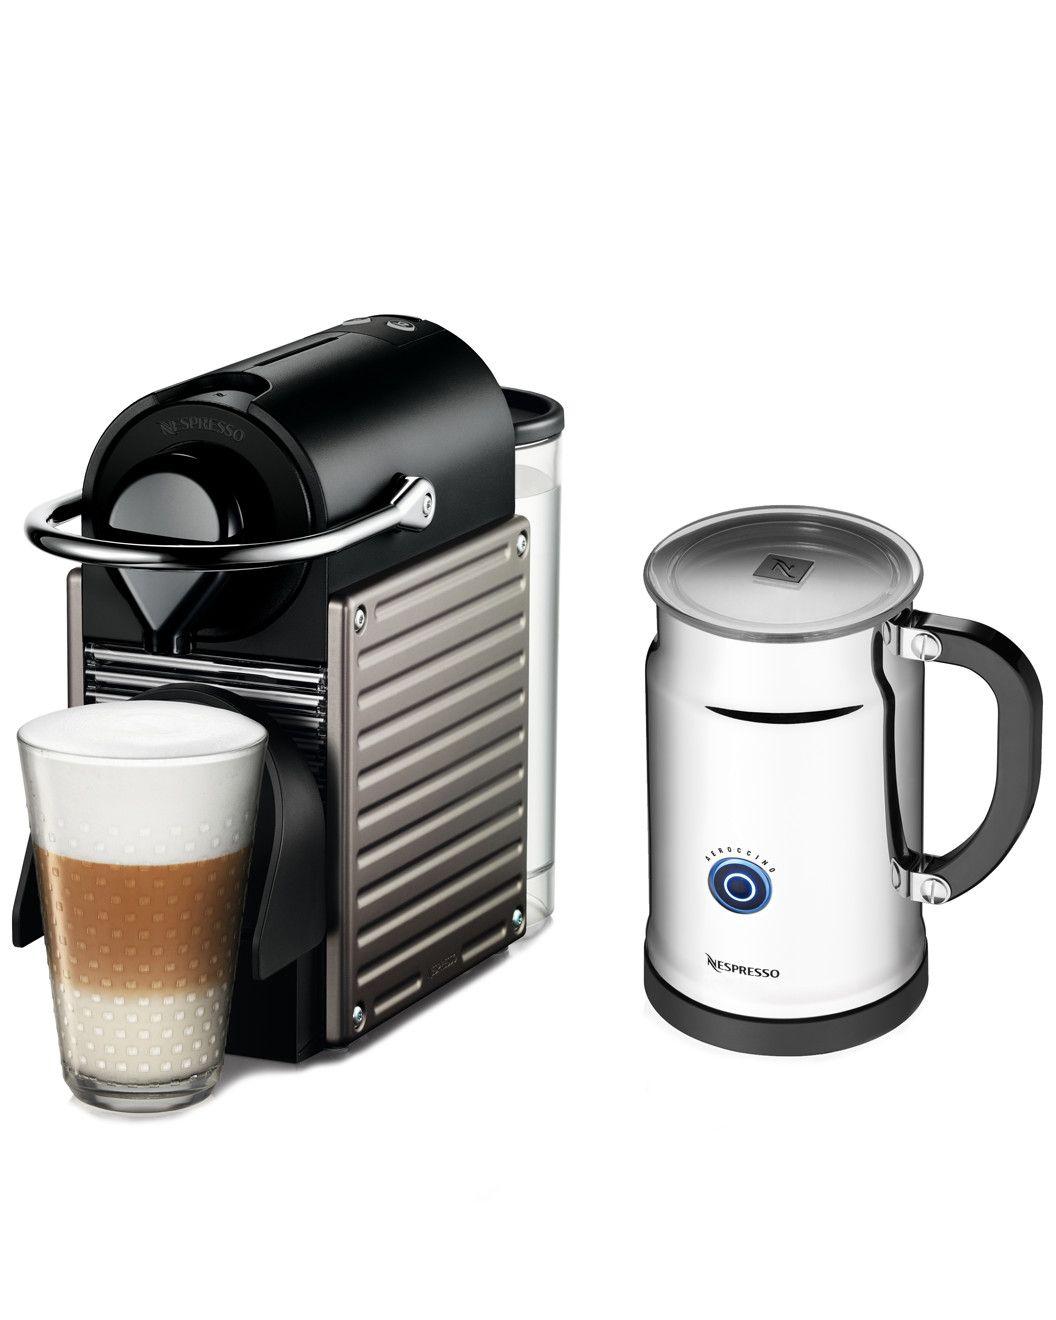 Spotted This Nespresso Pixie Espresso Machine Aeroccino On Rue